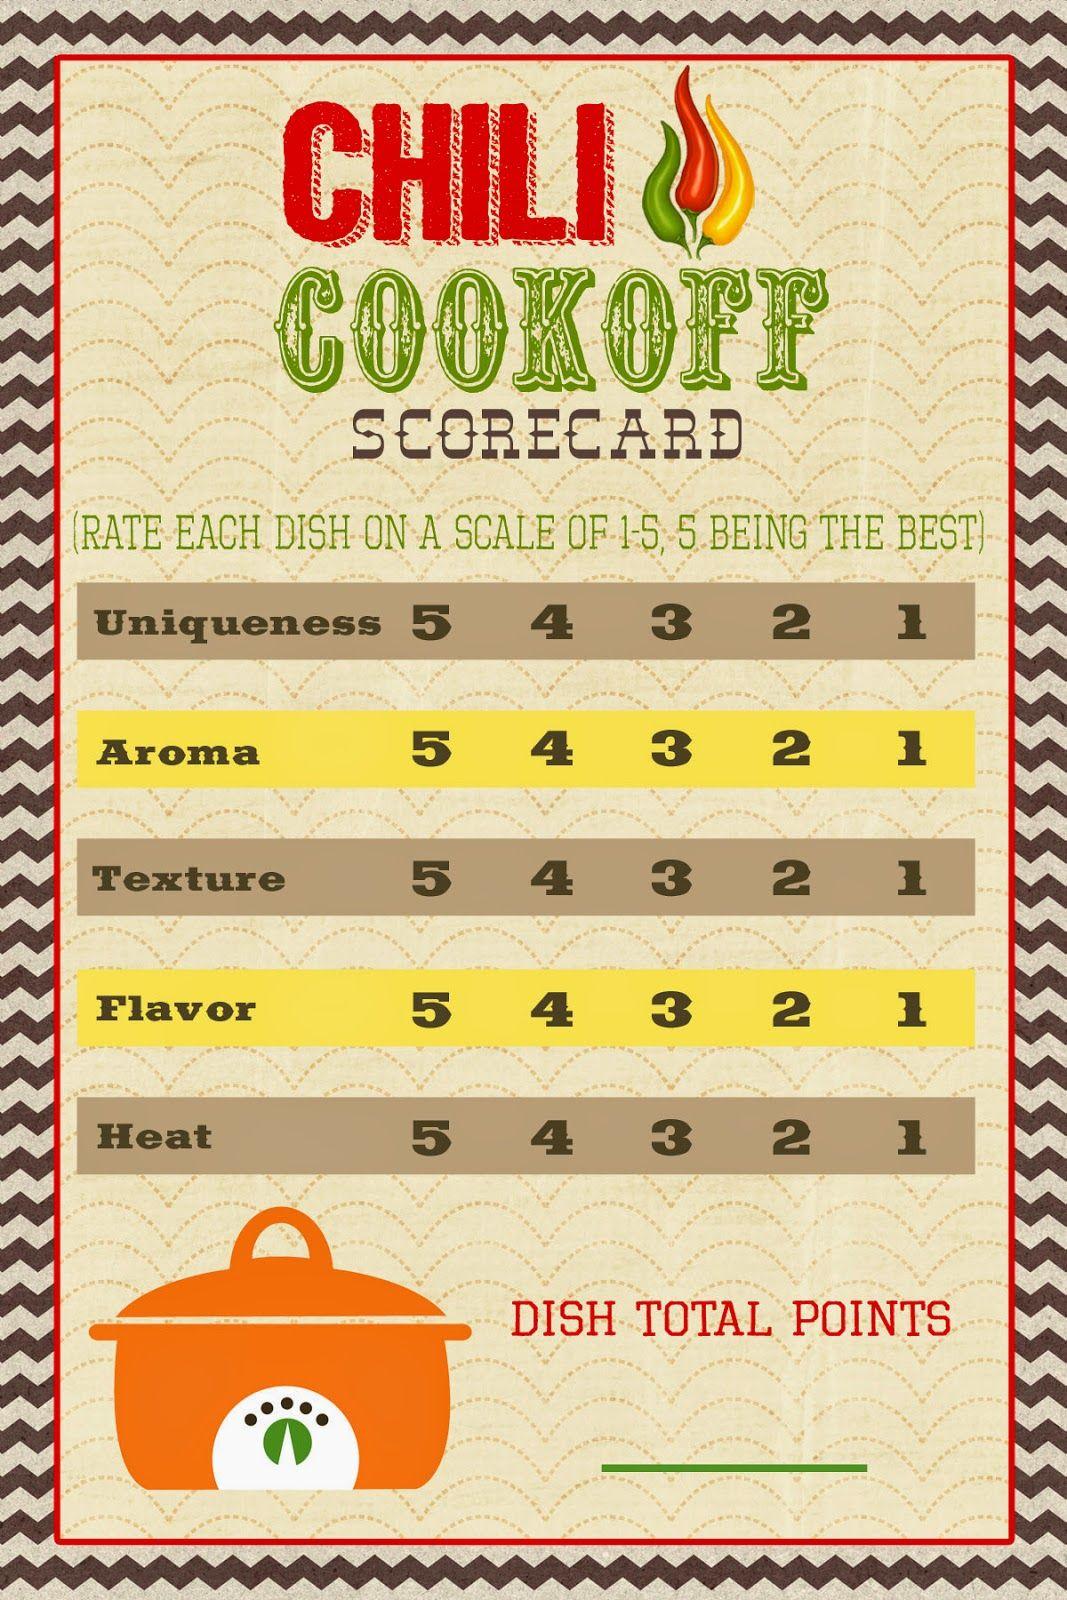 A pocket full of lds prints chili cook off scorecard 2016 a pocket full of lds prints chili cook off scorecard xflitez Choice Image